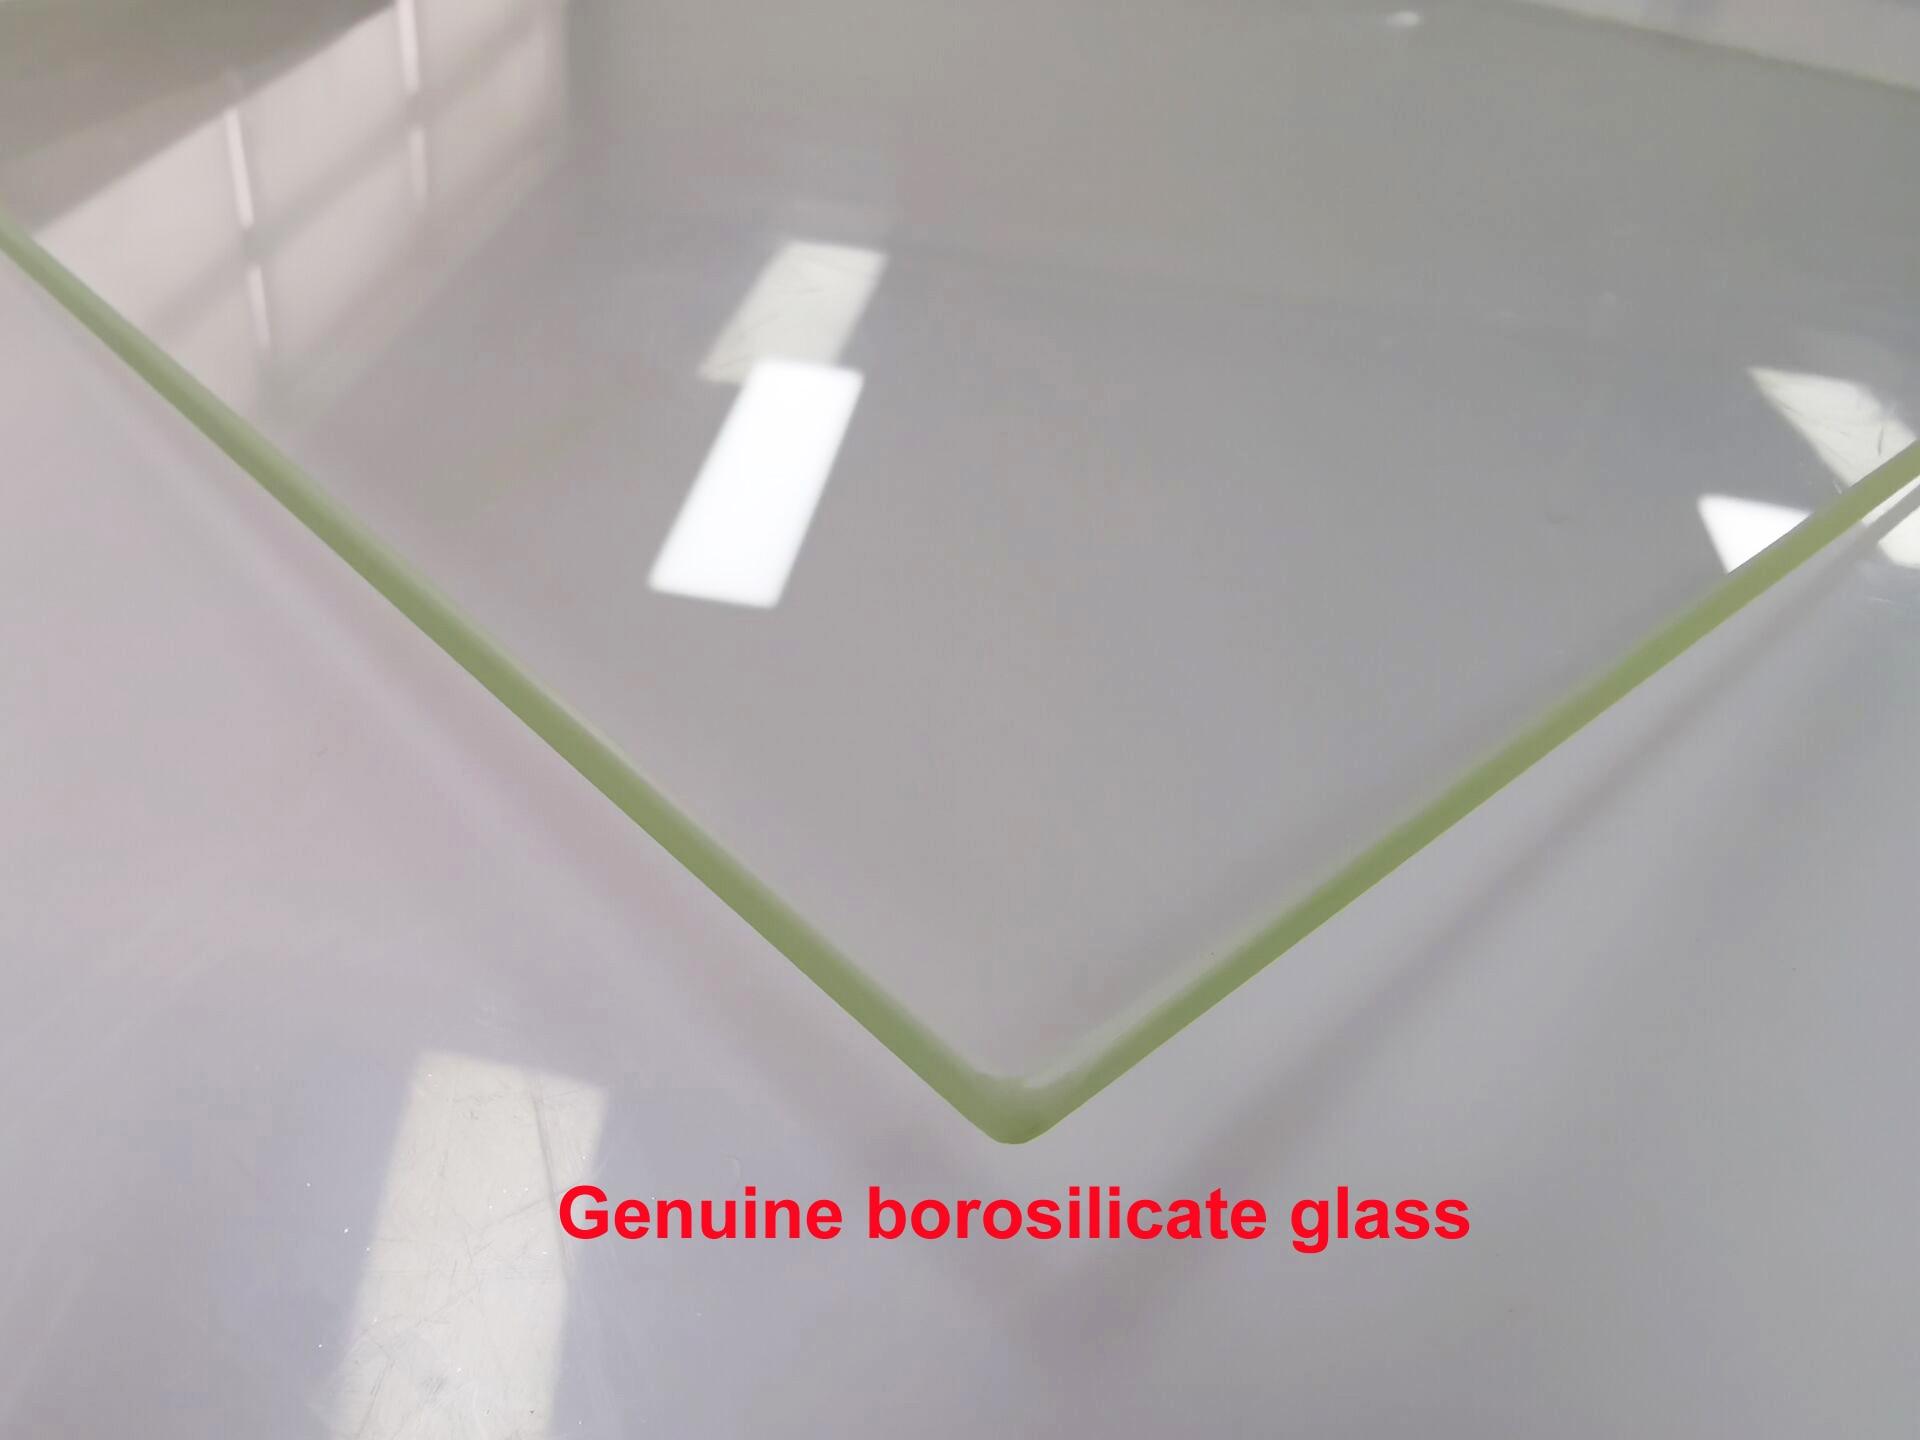 3D Printer Borosilicate Glass Build Plate for MK2 Makerbot Creality Flashforge Wanhao CTC ANET Prusa